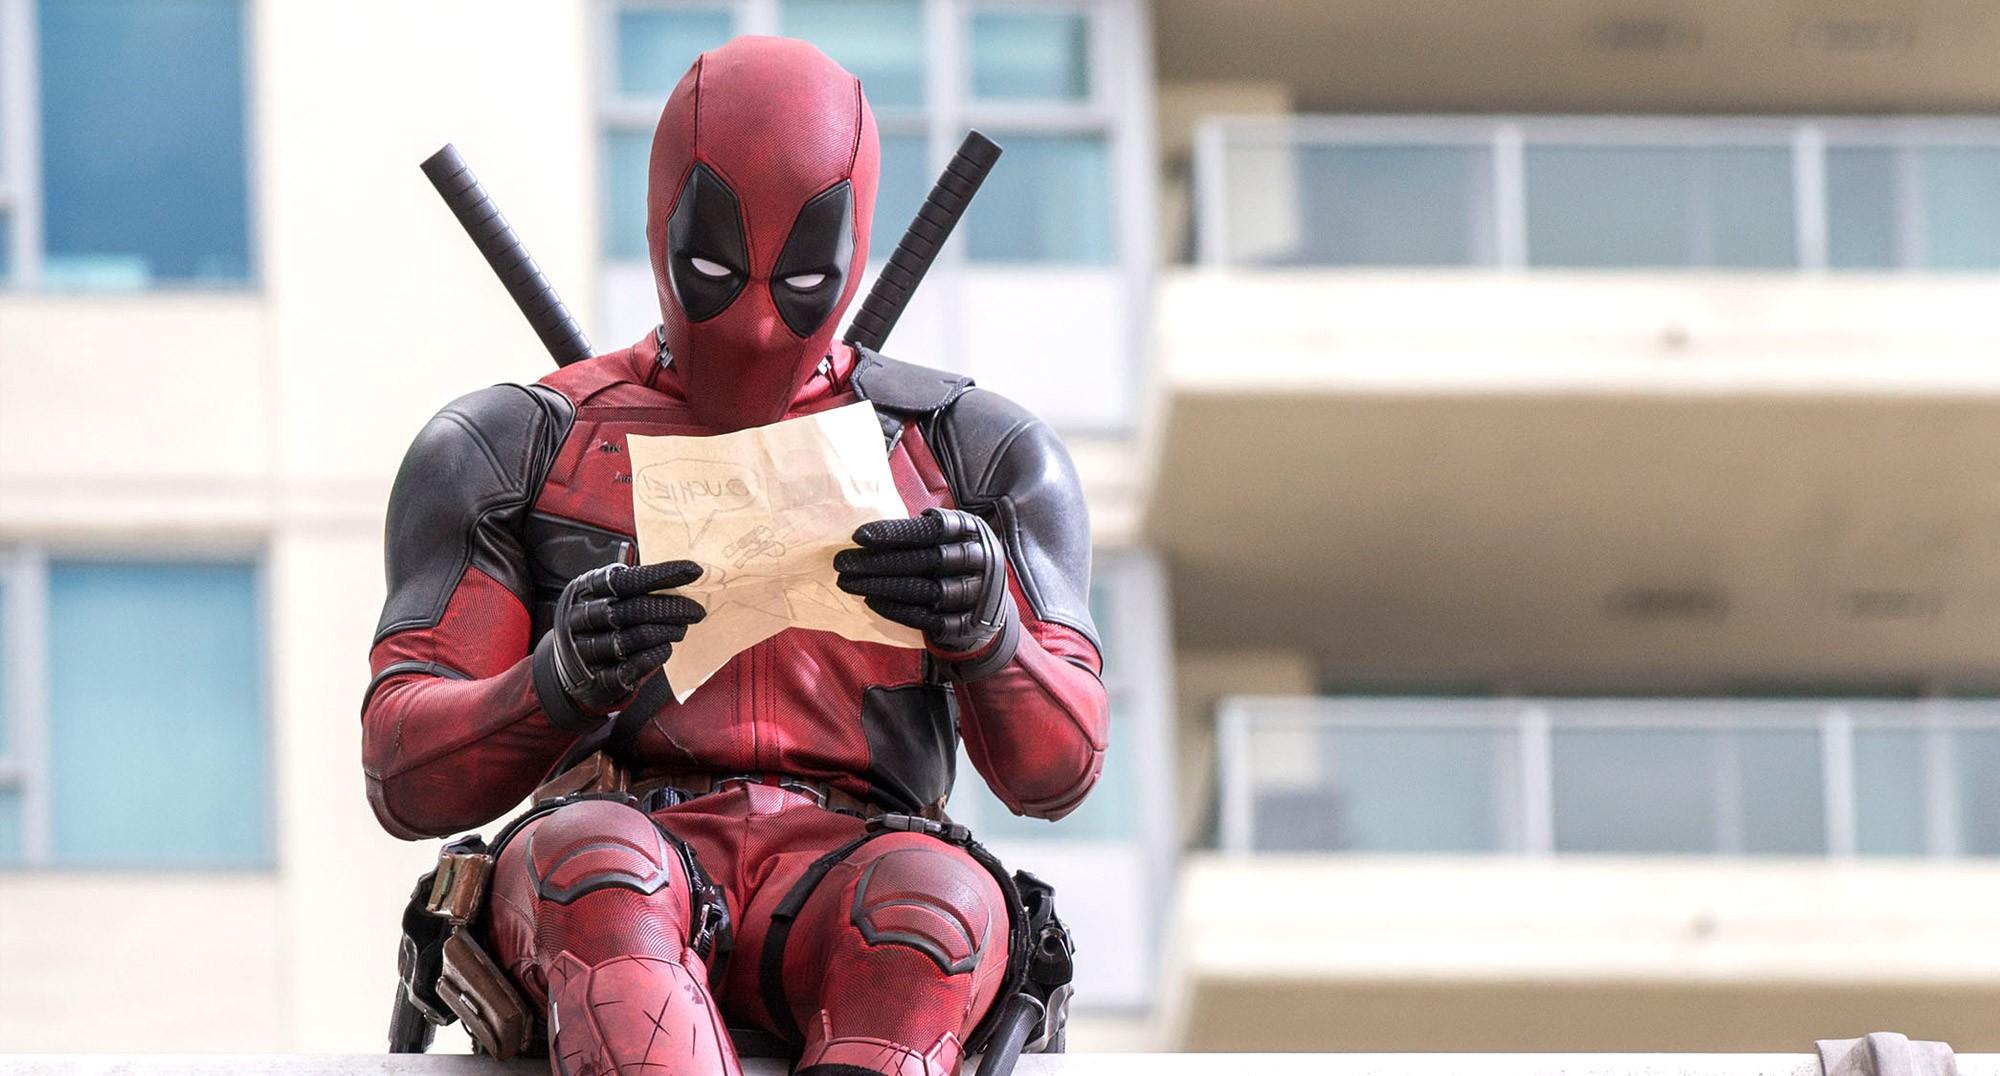 Can 'Deadpool' get a surprise Oscar nod for screenplay?